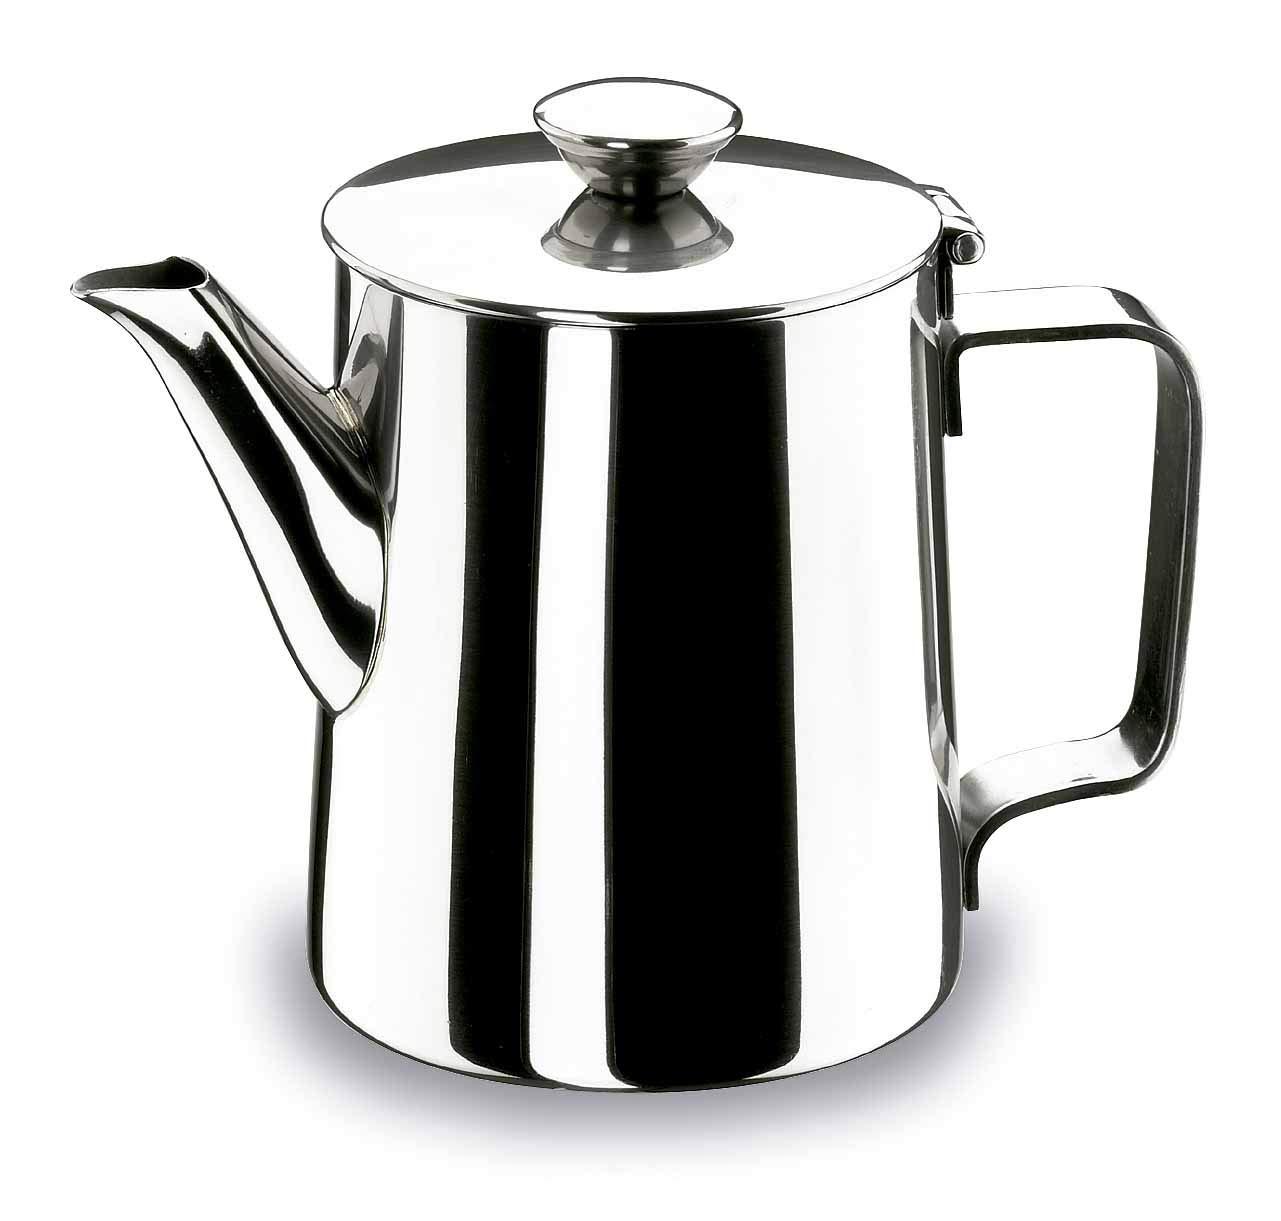 Lacor - 62110 - Cafetera Classic Inox. 1 litro: Amazon.es: Hogar